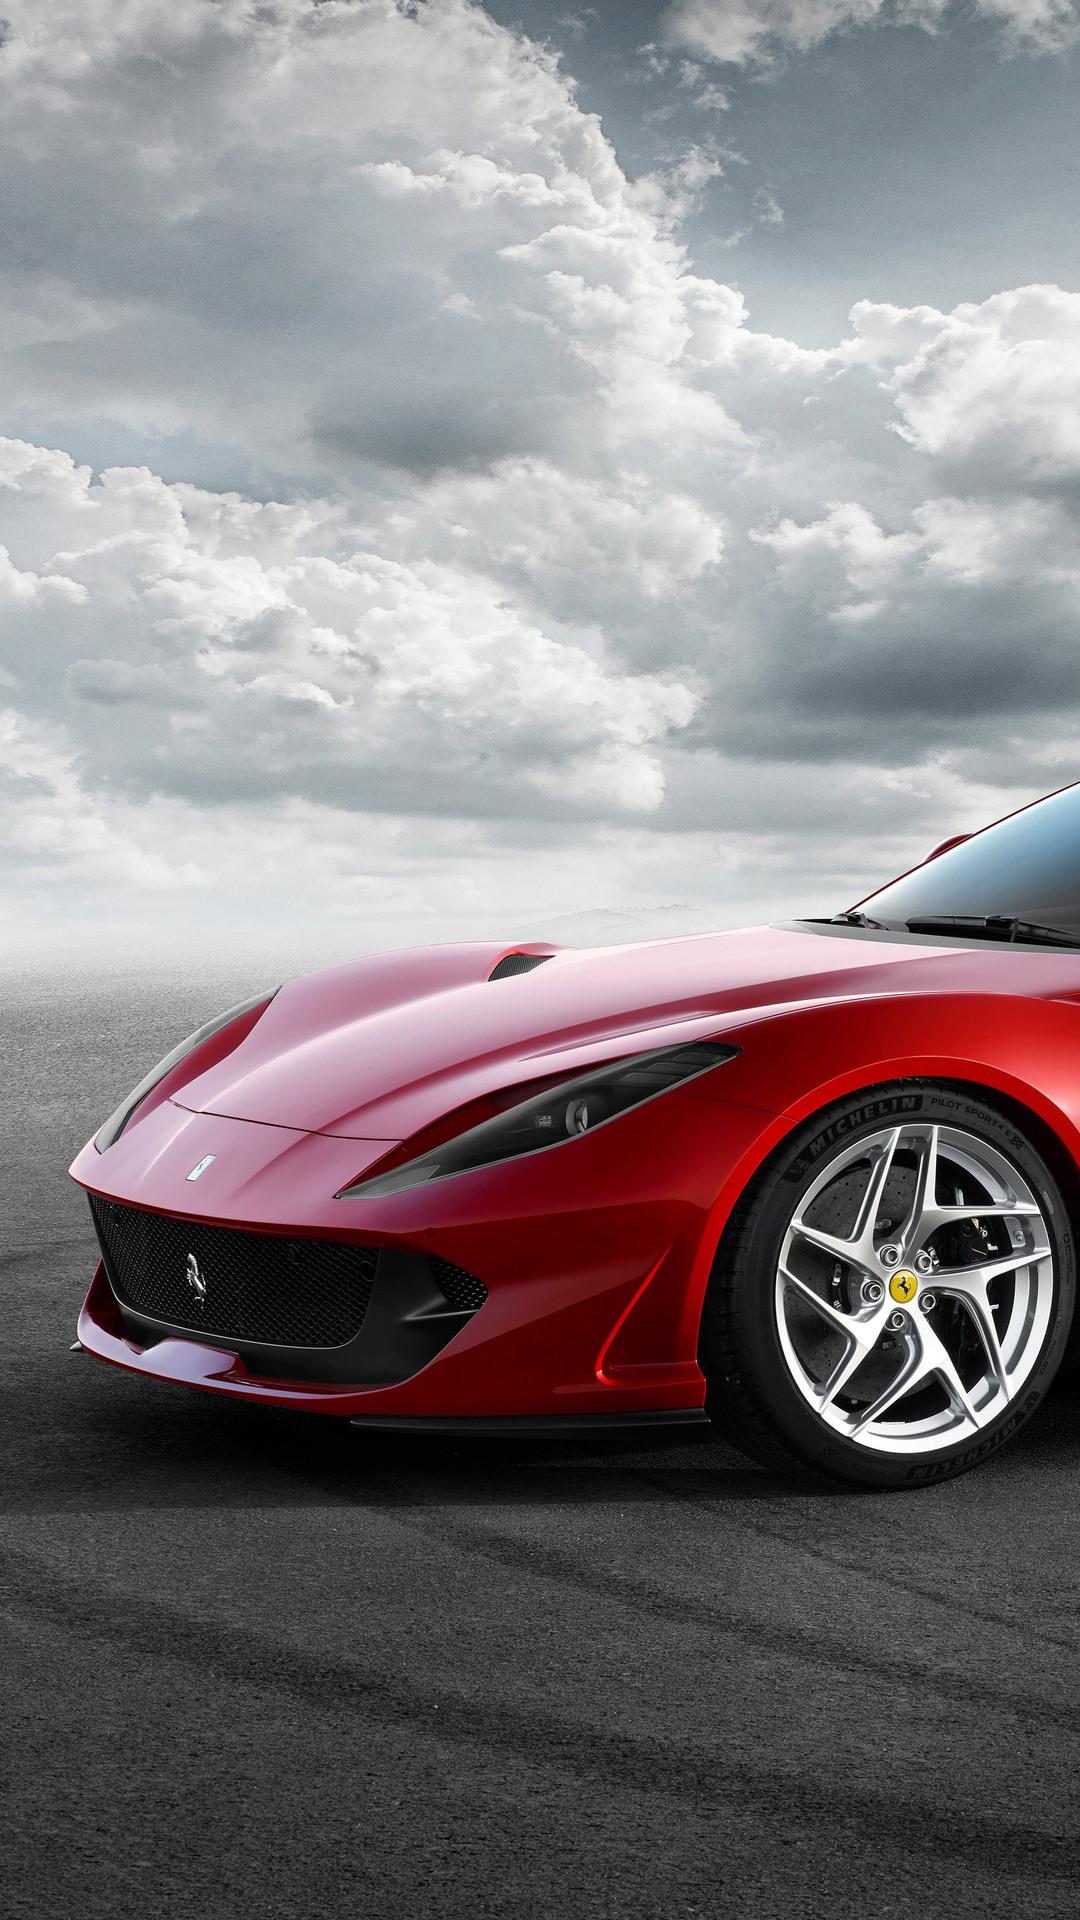 Ferrari Wallpaper 4K Iphone